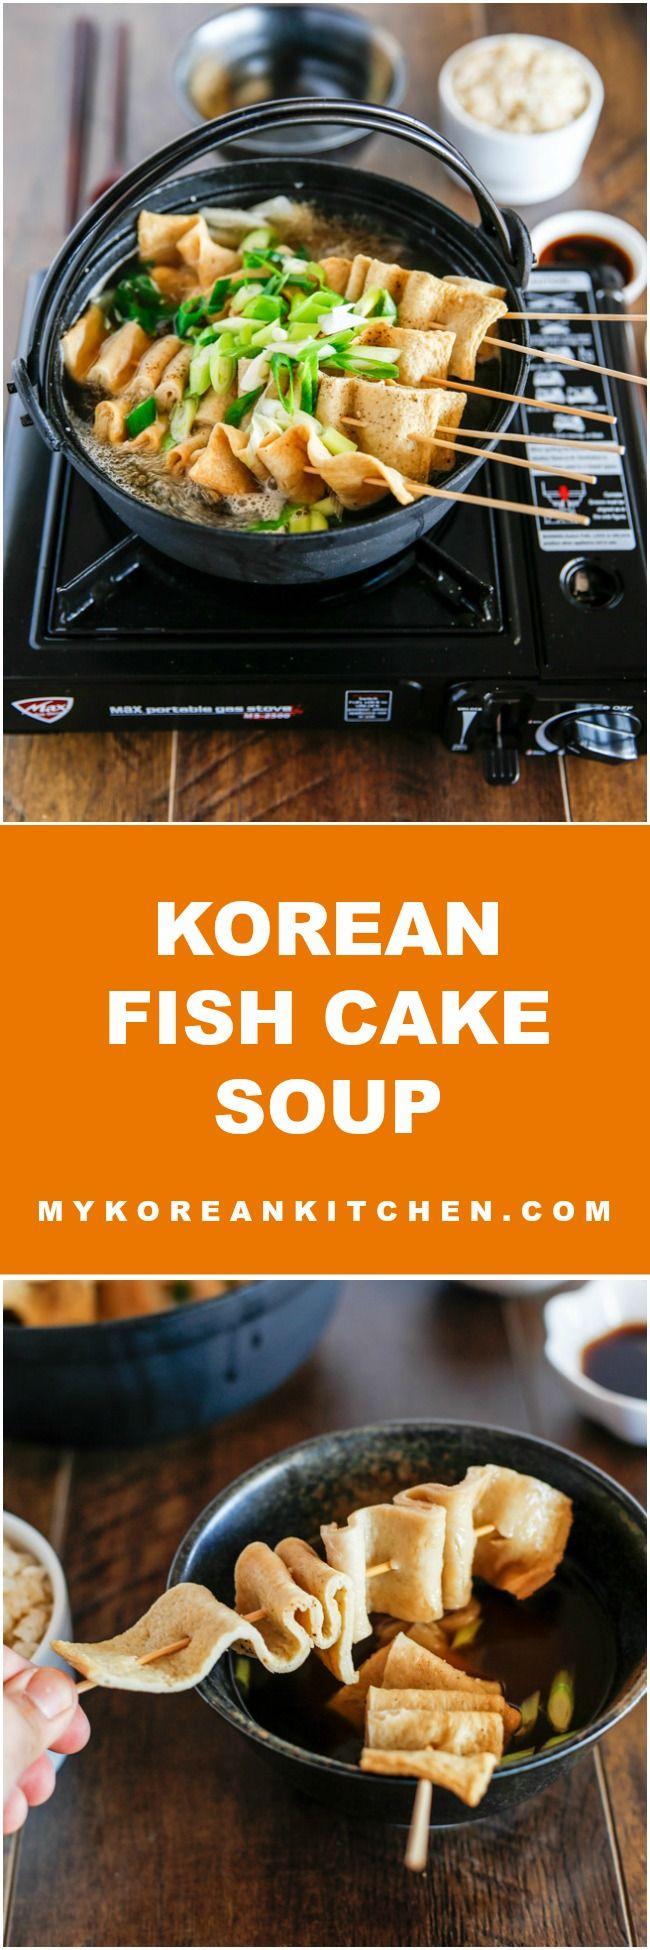 Refreshing, tasty and comforting Korean fish cake soup | MyKoreanKitchen.com